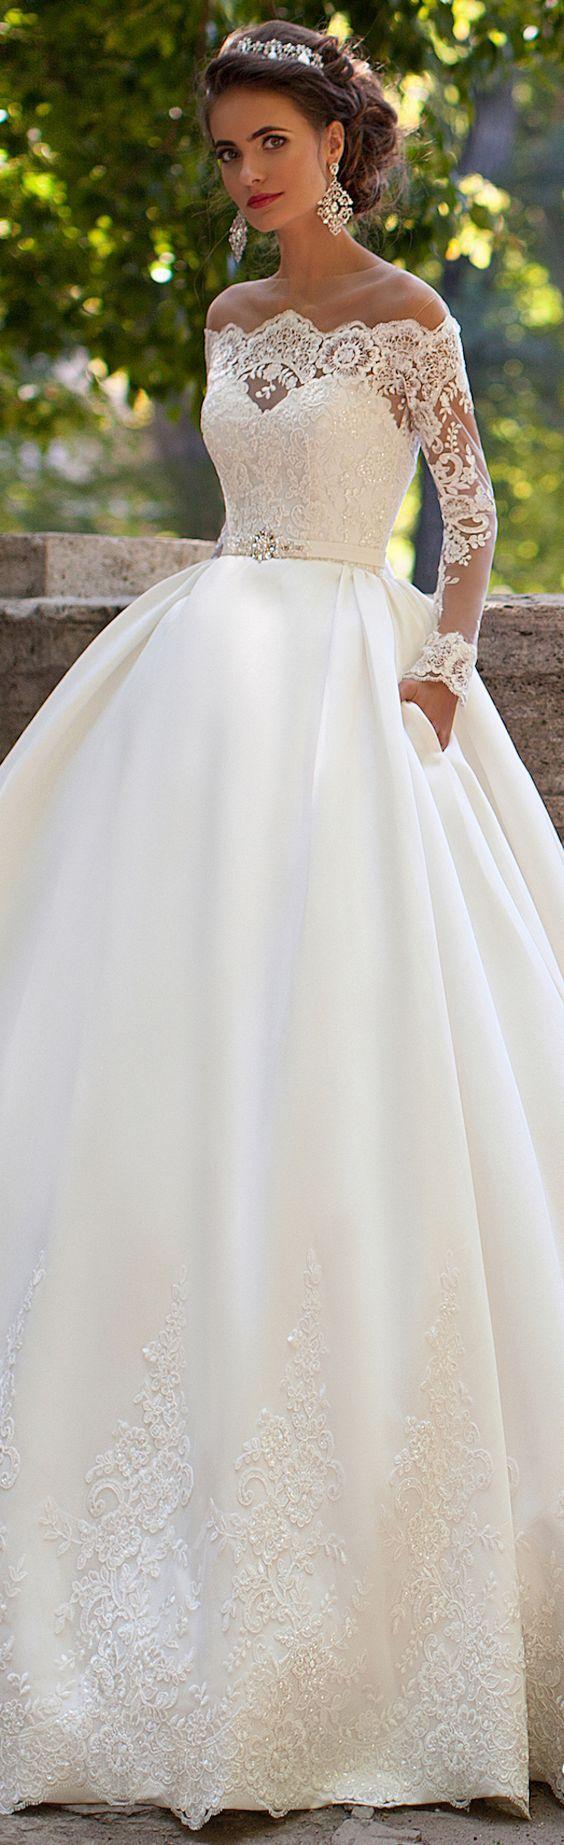 sleeve wedding dresses sleeved wedding dress Stunning Long Sleeve Wedding Dresses